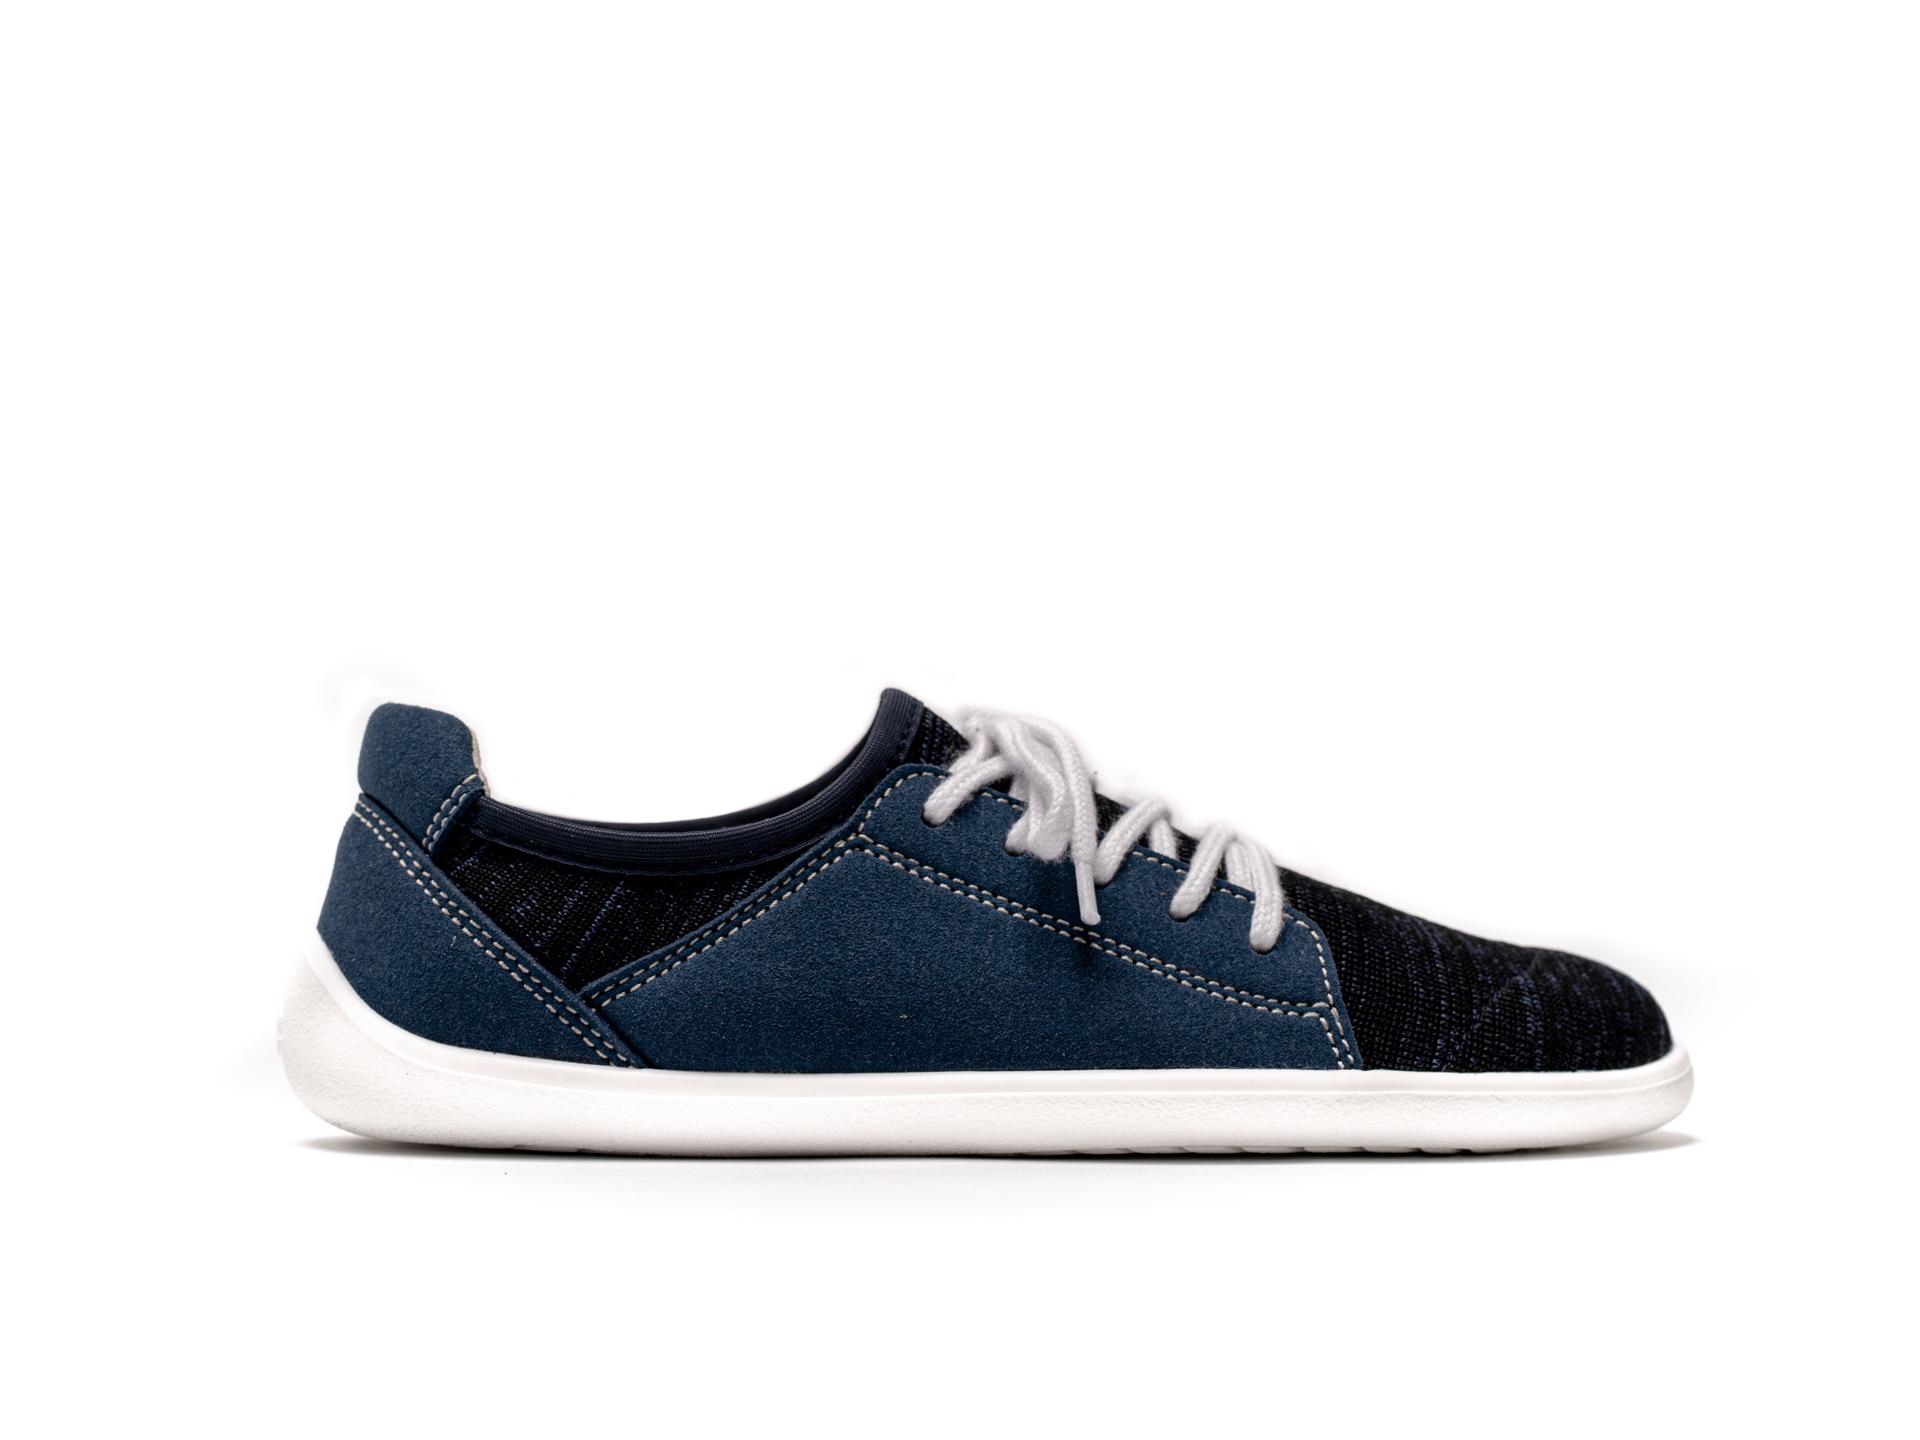 Barefoot Sneakers Be Lenka Ace - Blau 42